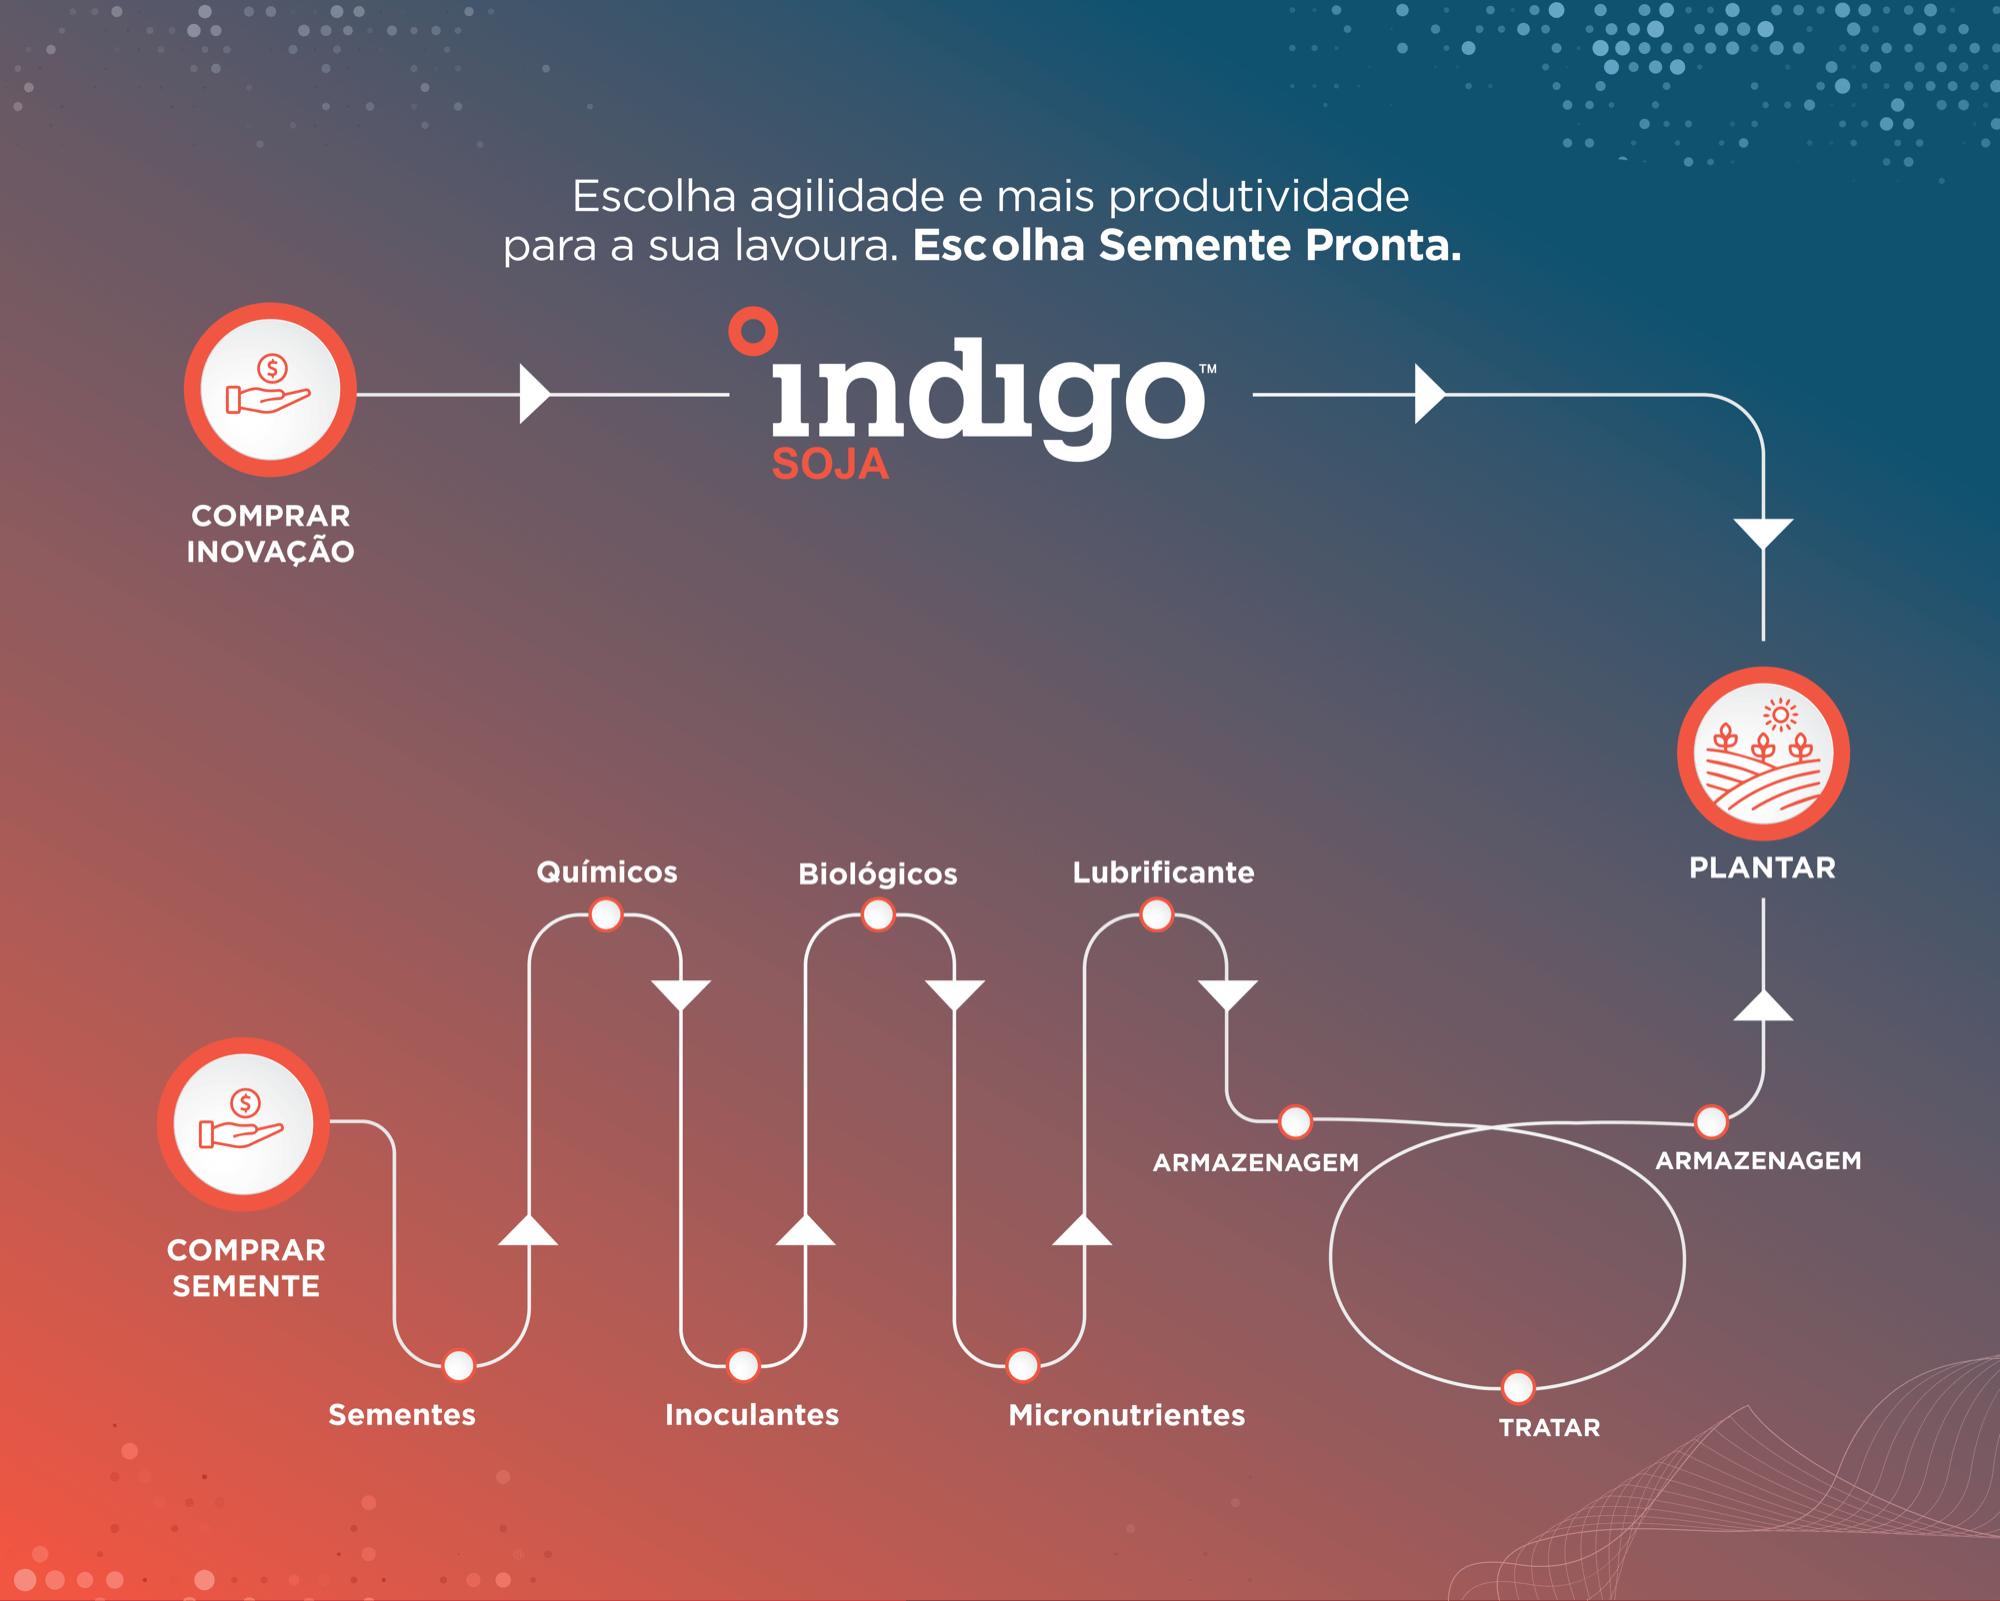 Indigo Soja_infographic_small